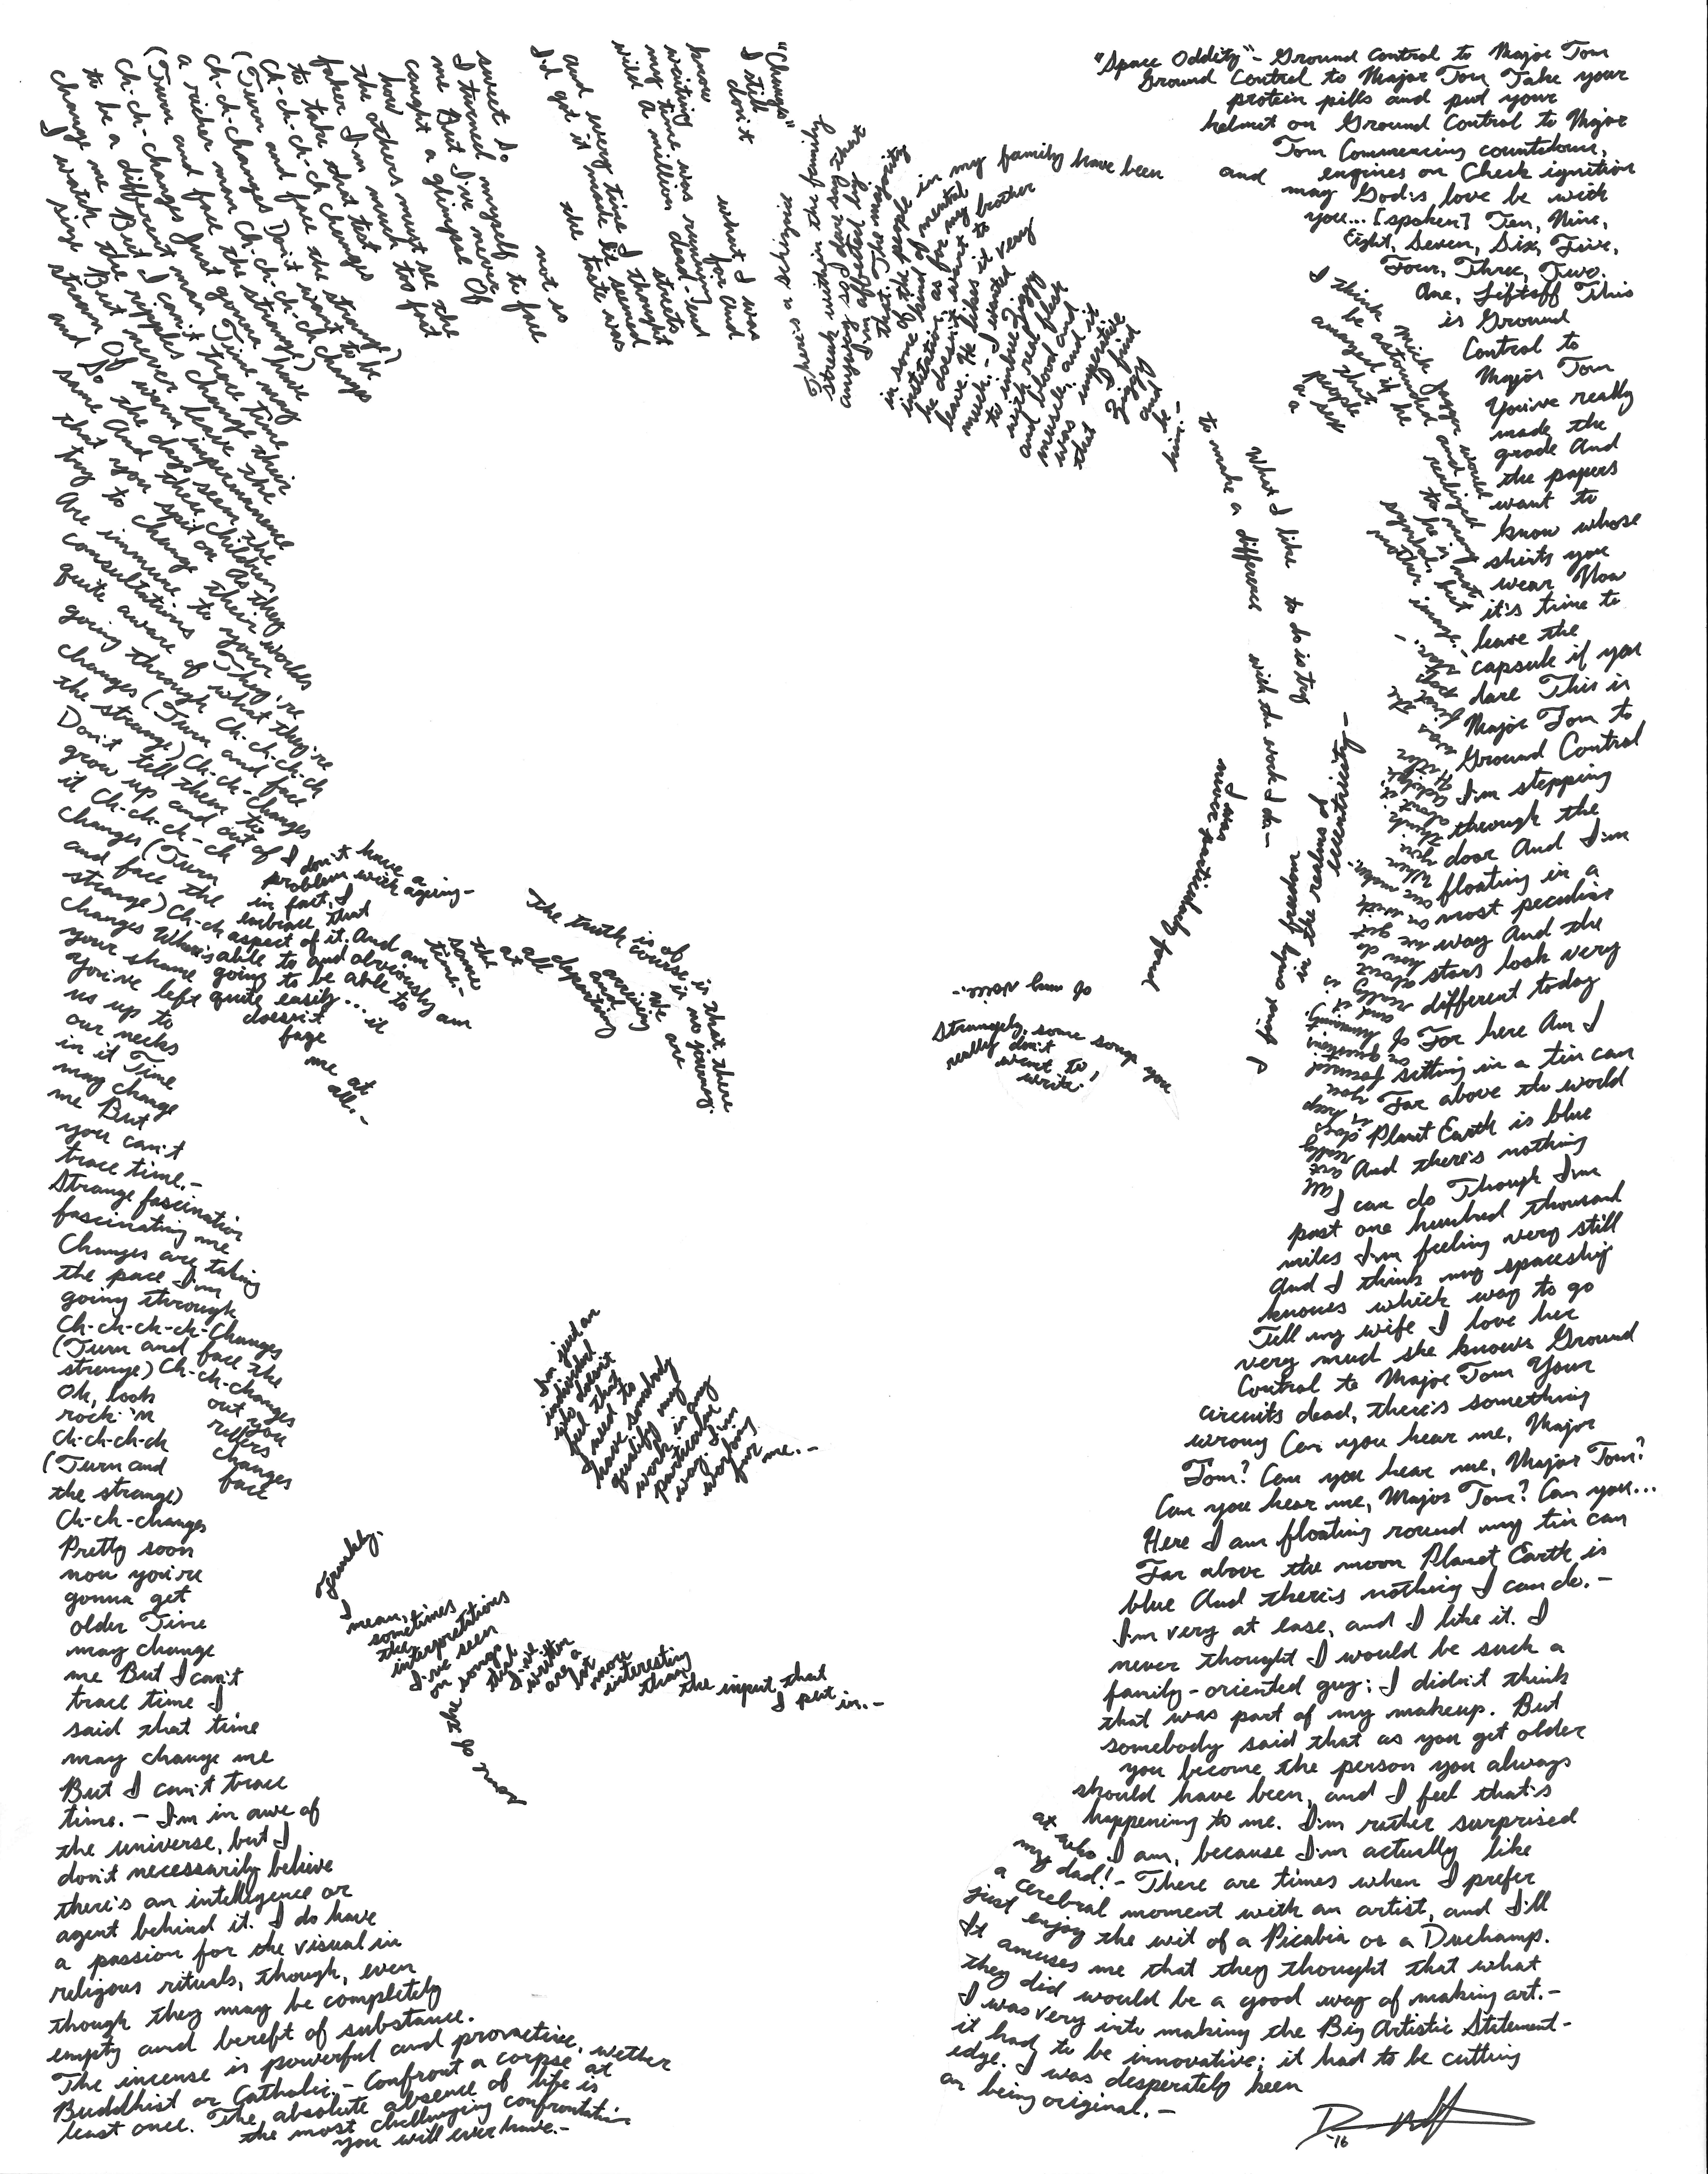 David Bowie - SOLD